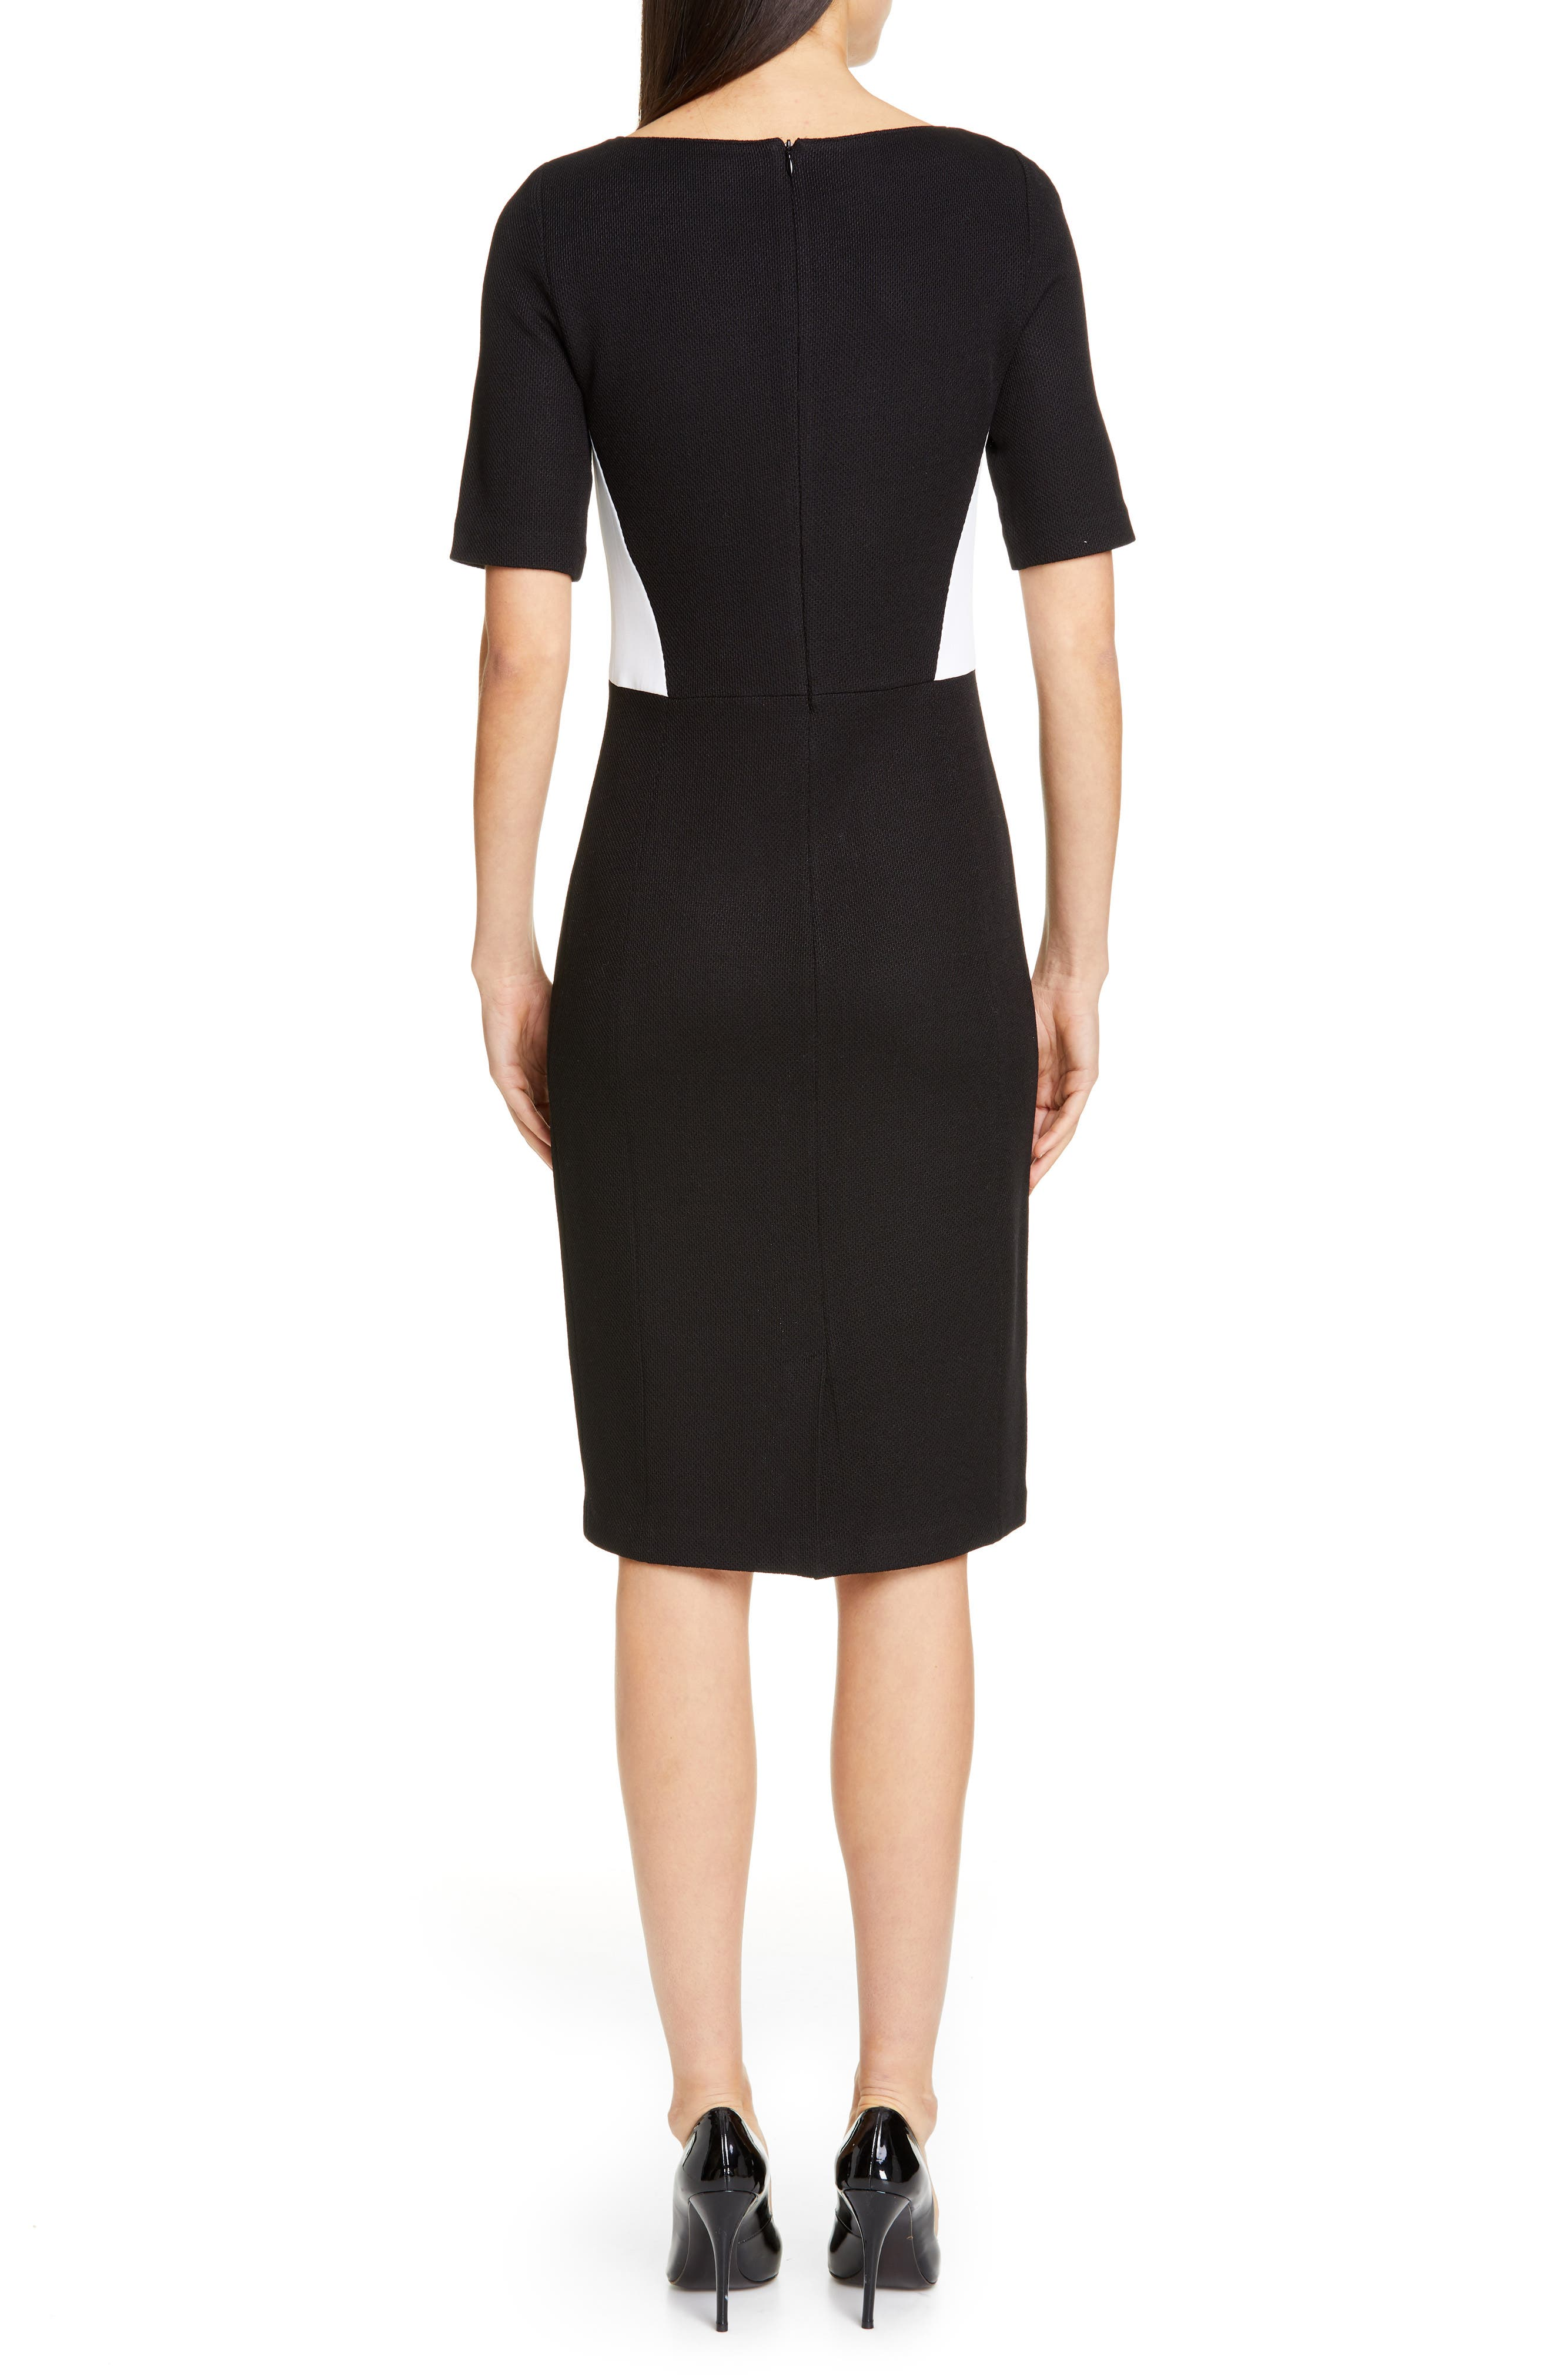 ST. JOHN COLLECTION, Piqué Milano Knit Dress, Alternate thumbnail 2, color, CAVIAR/ BIANCO